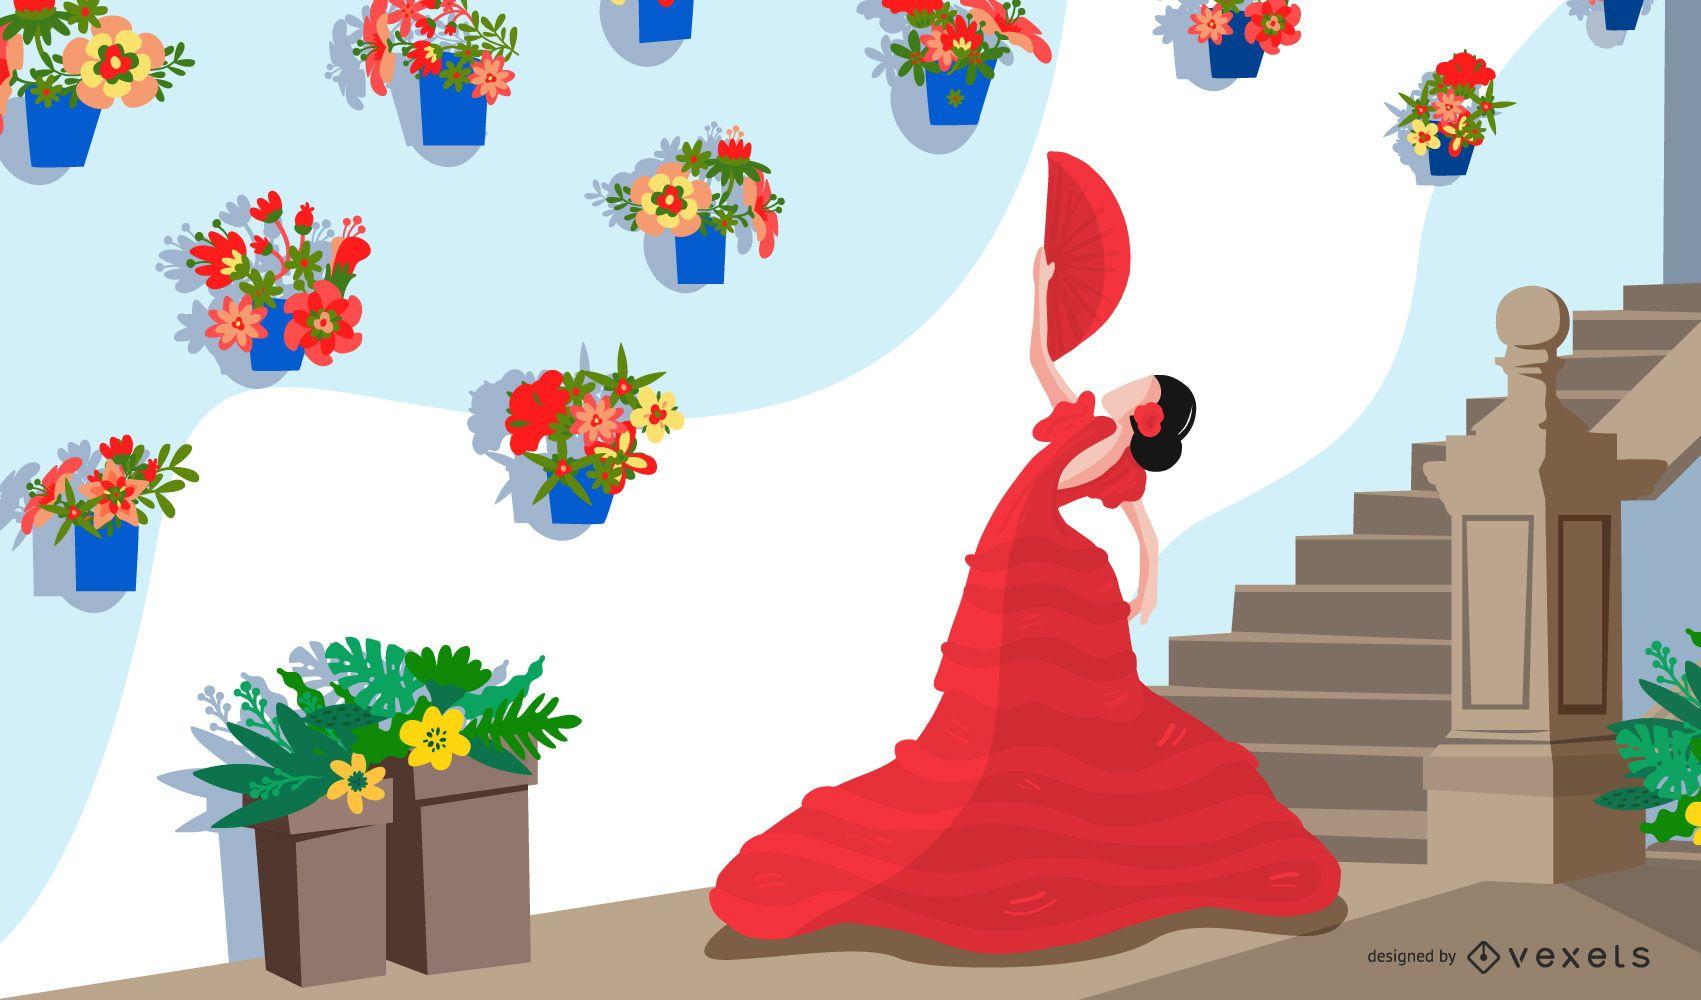 Diseño de papel tapiz de la cultura de España